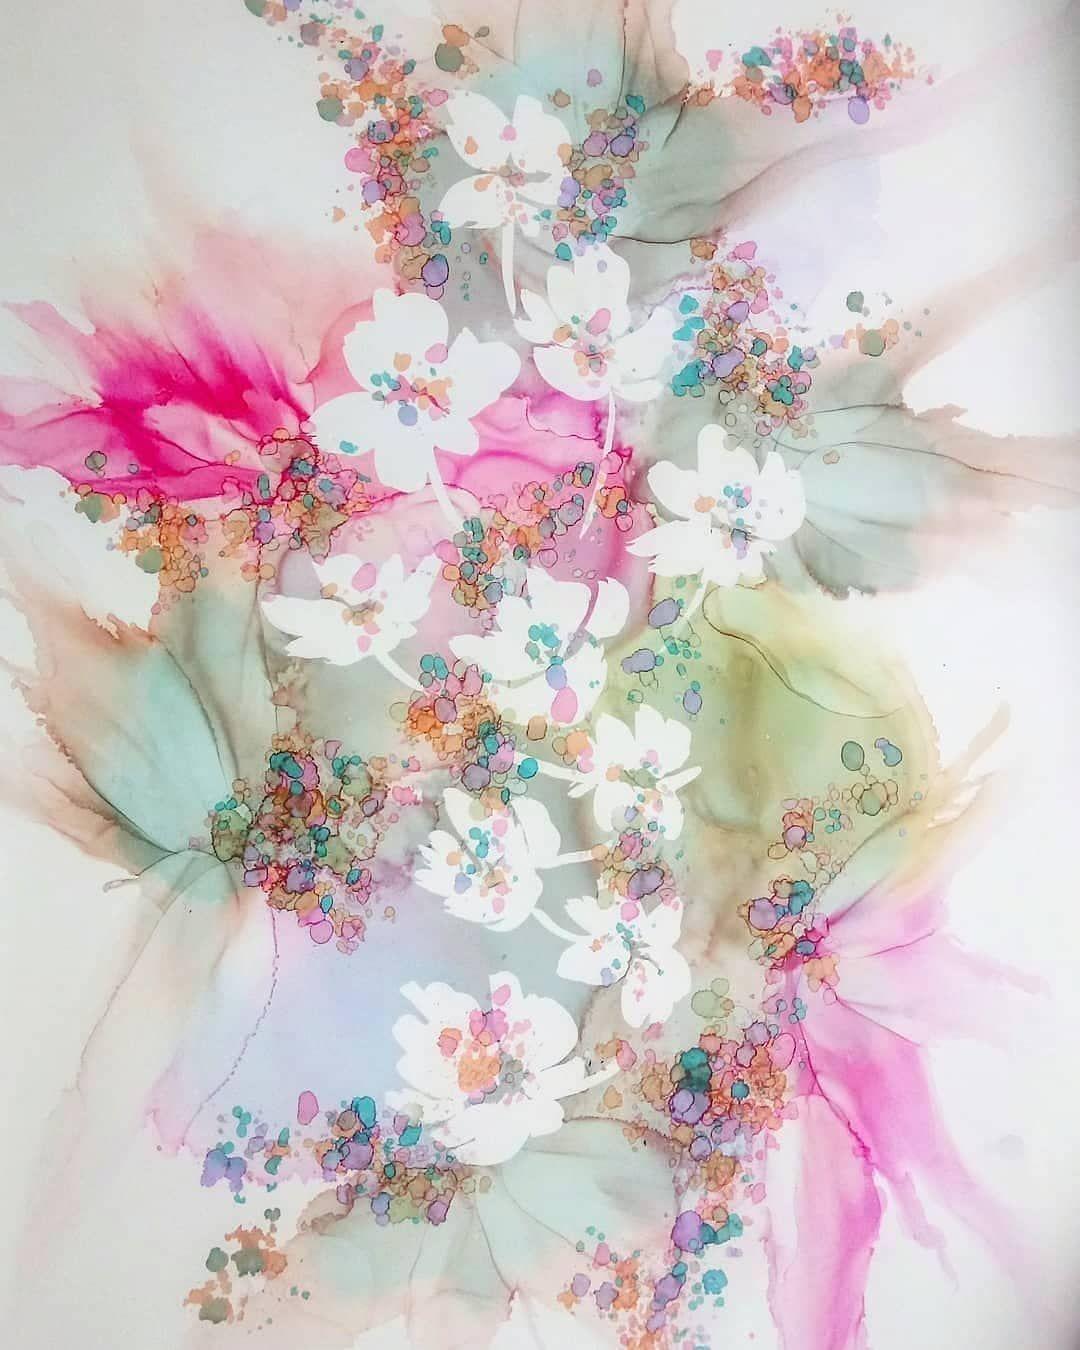 Bloomnjazz art on instagram 30 discount on all my